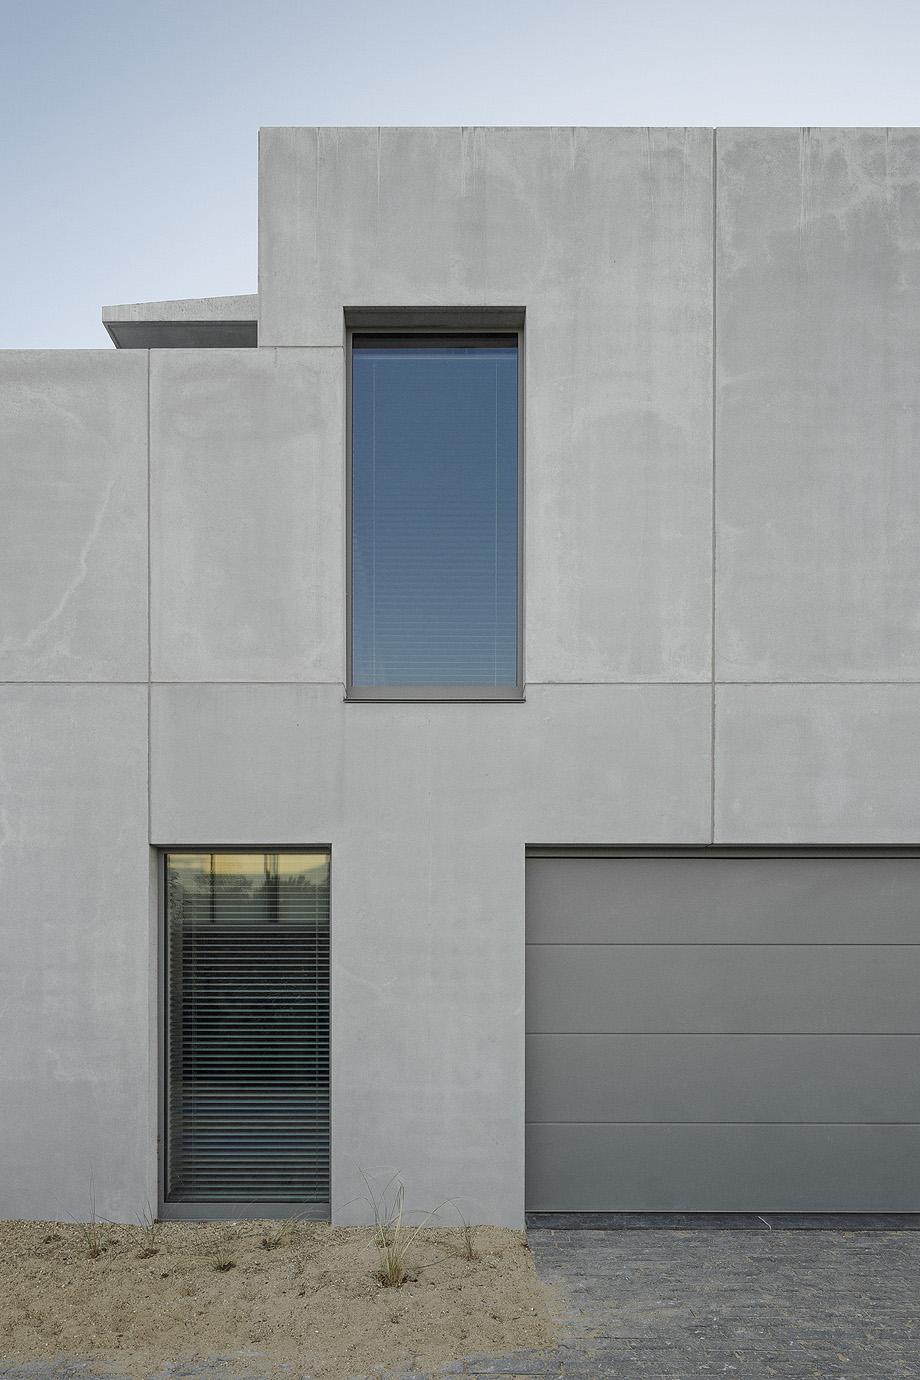 casa vle de ism architecten y paul ibens (25)